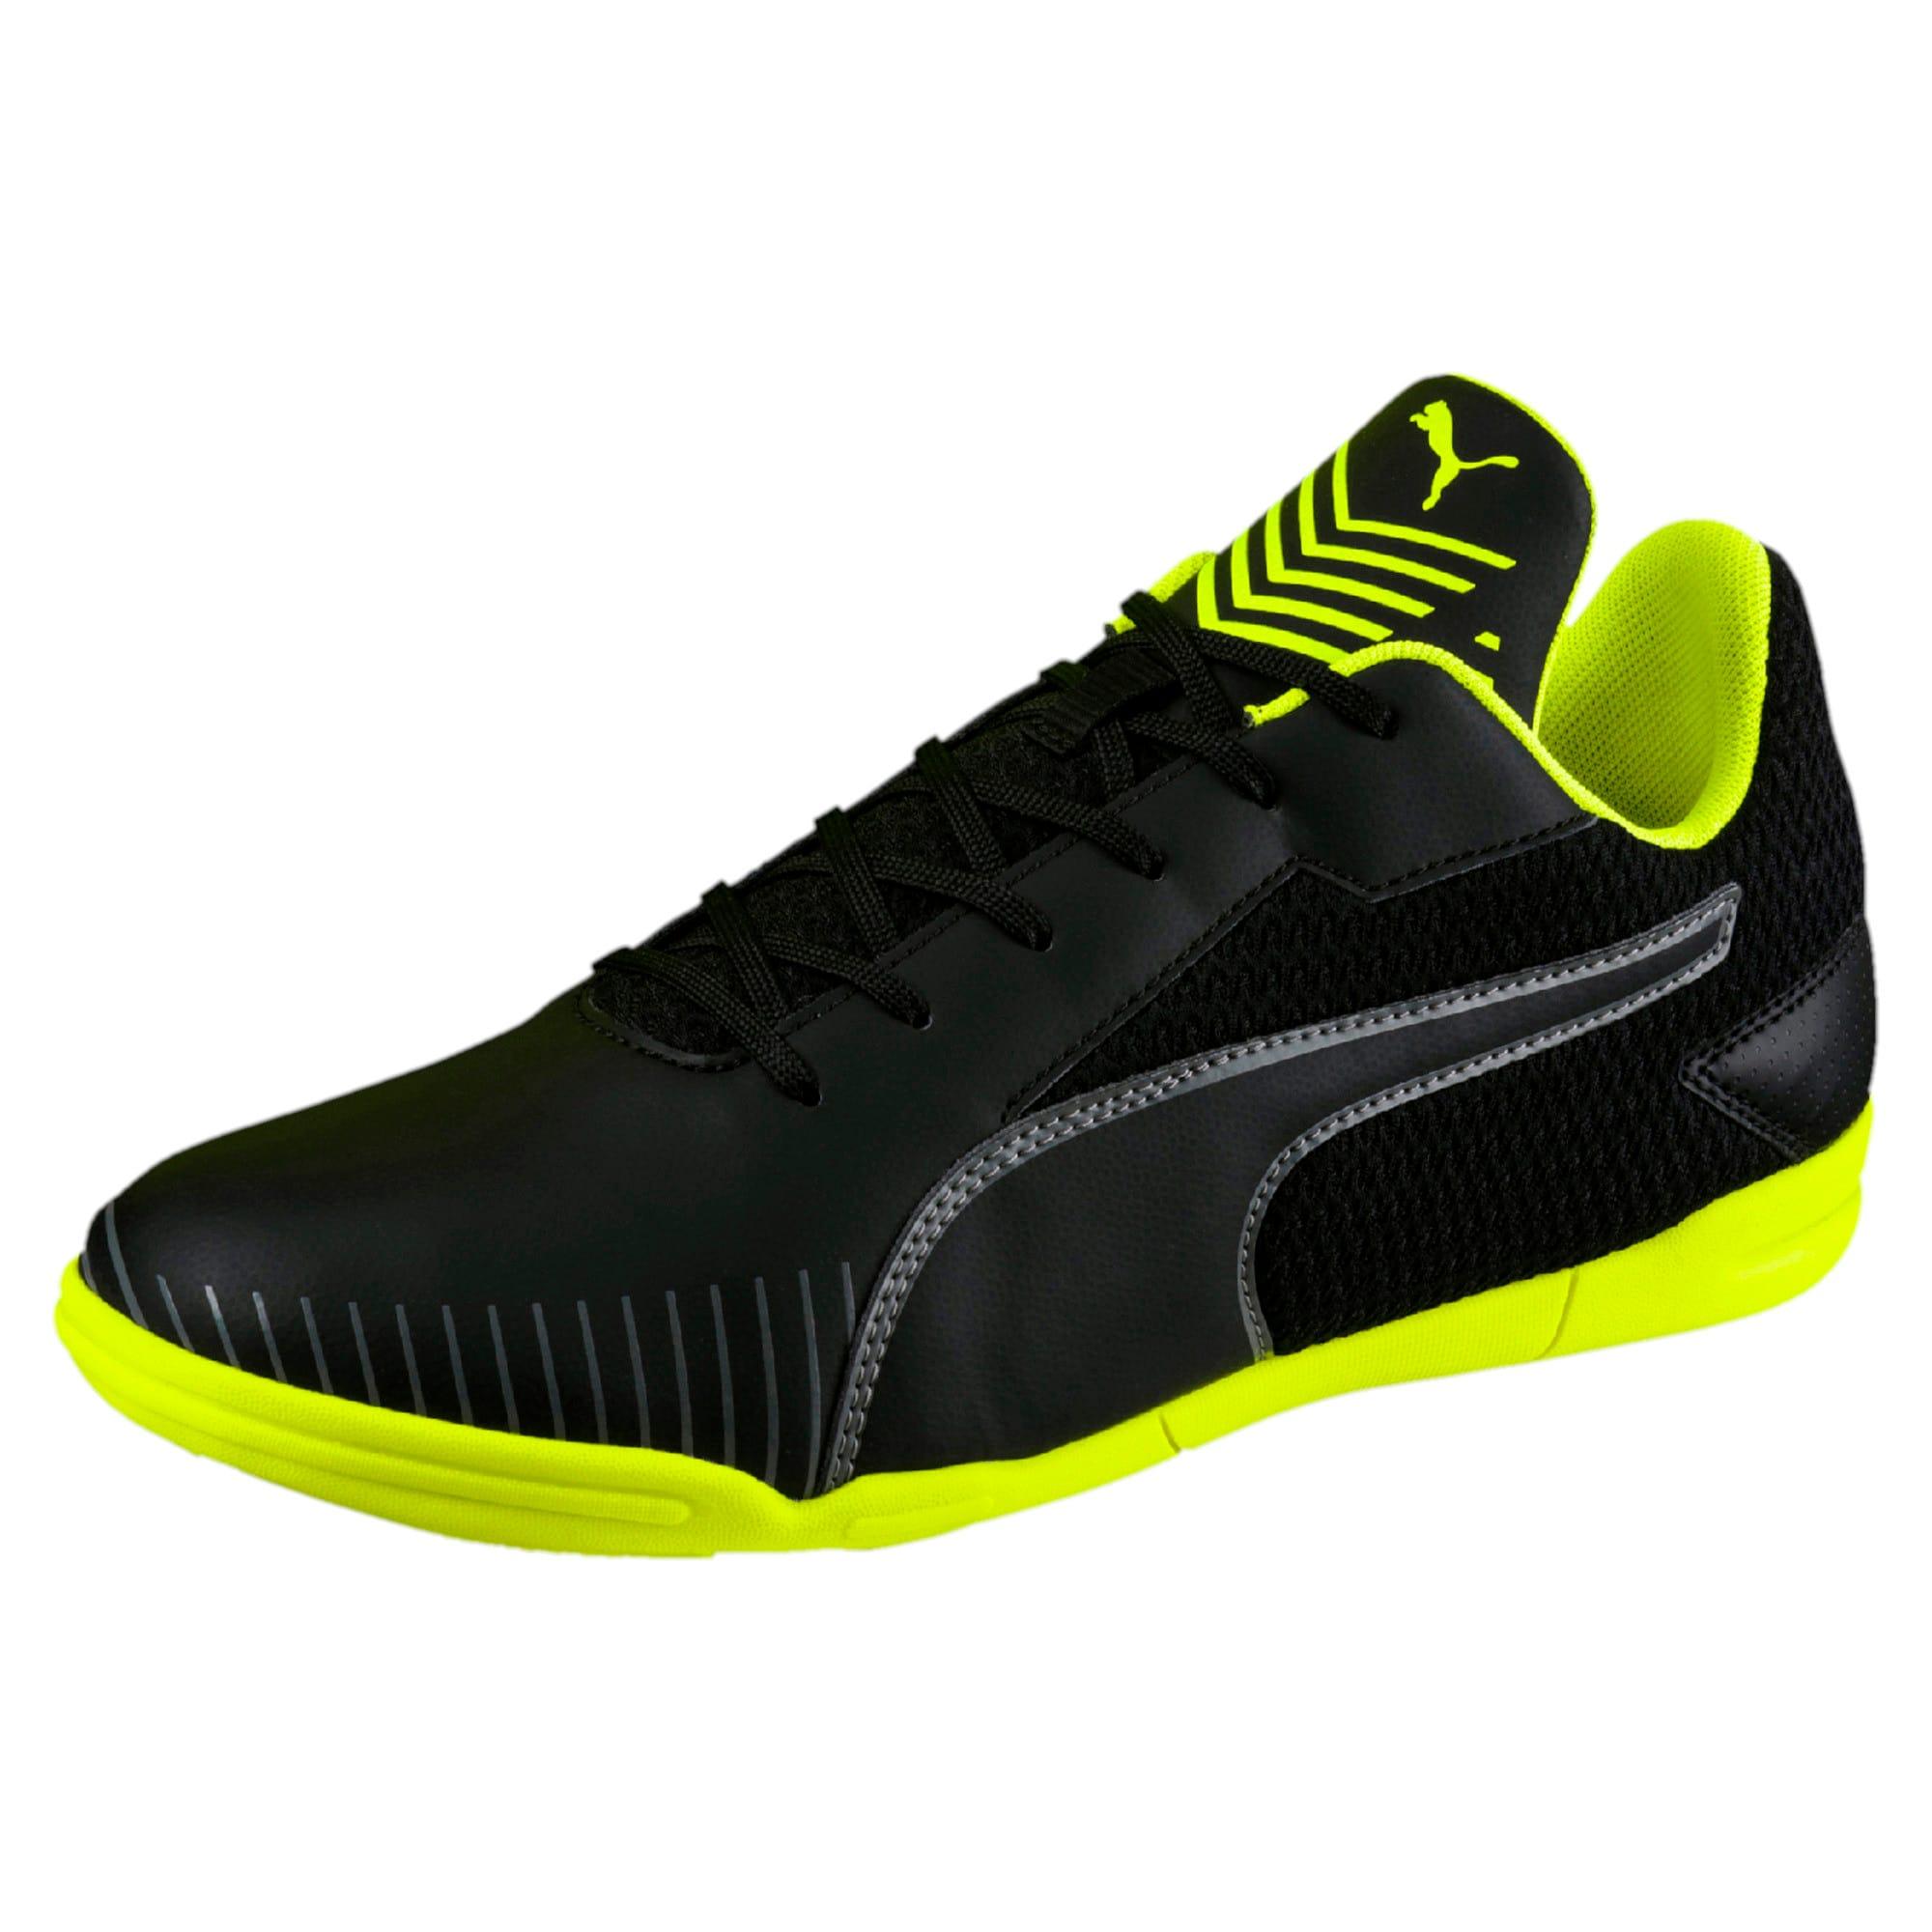 Thumbnail 1 of 365 CT Men's Court Football Shoes, Black-Black-Yellow-White, medium-IND